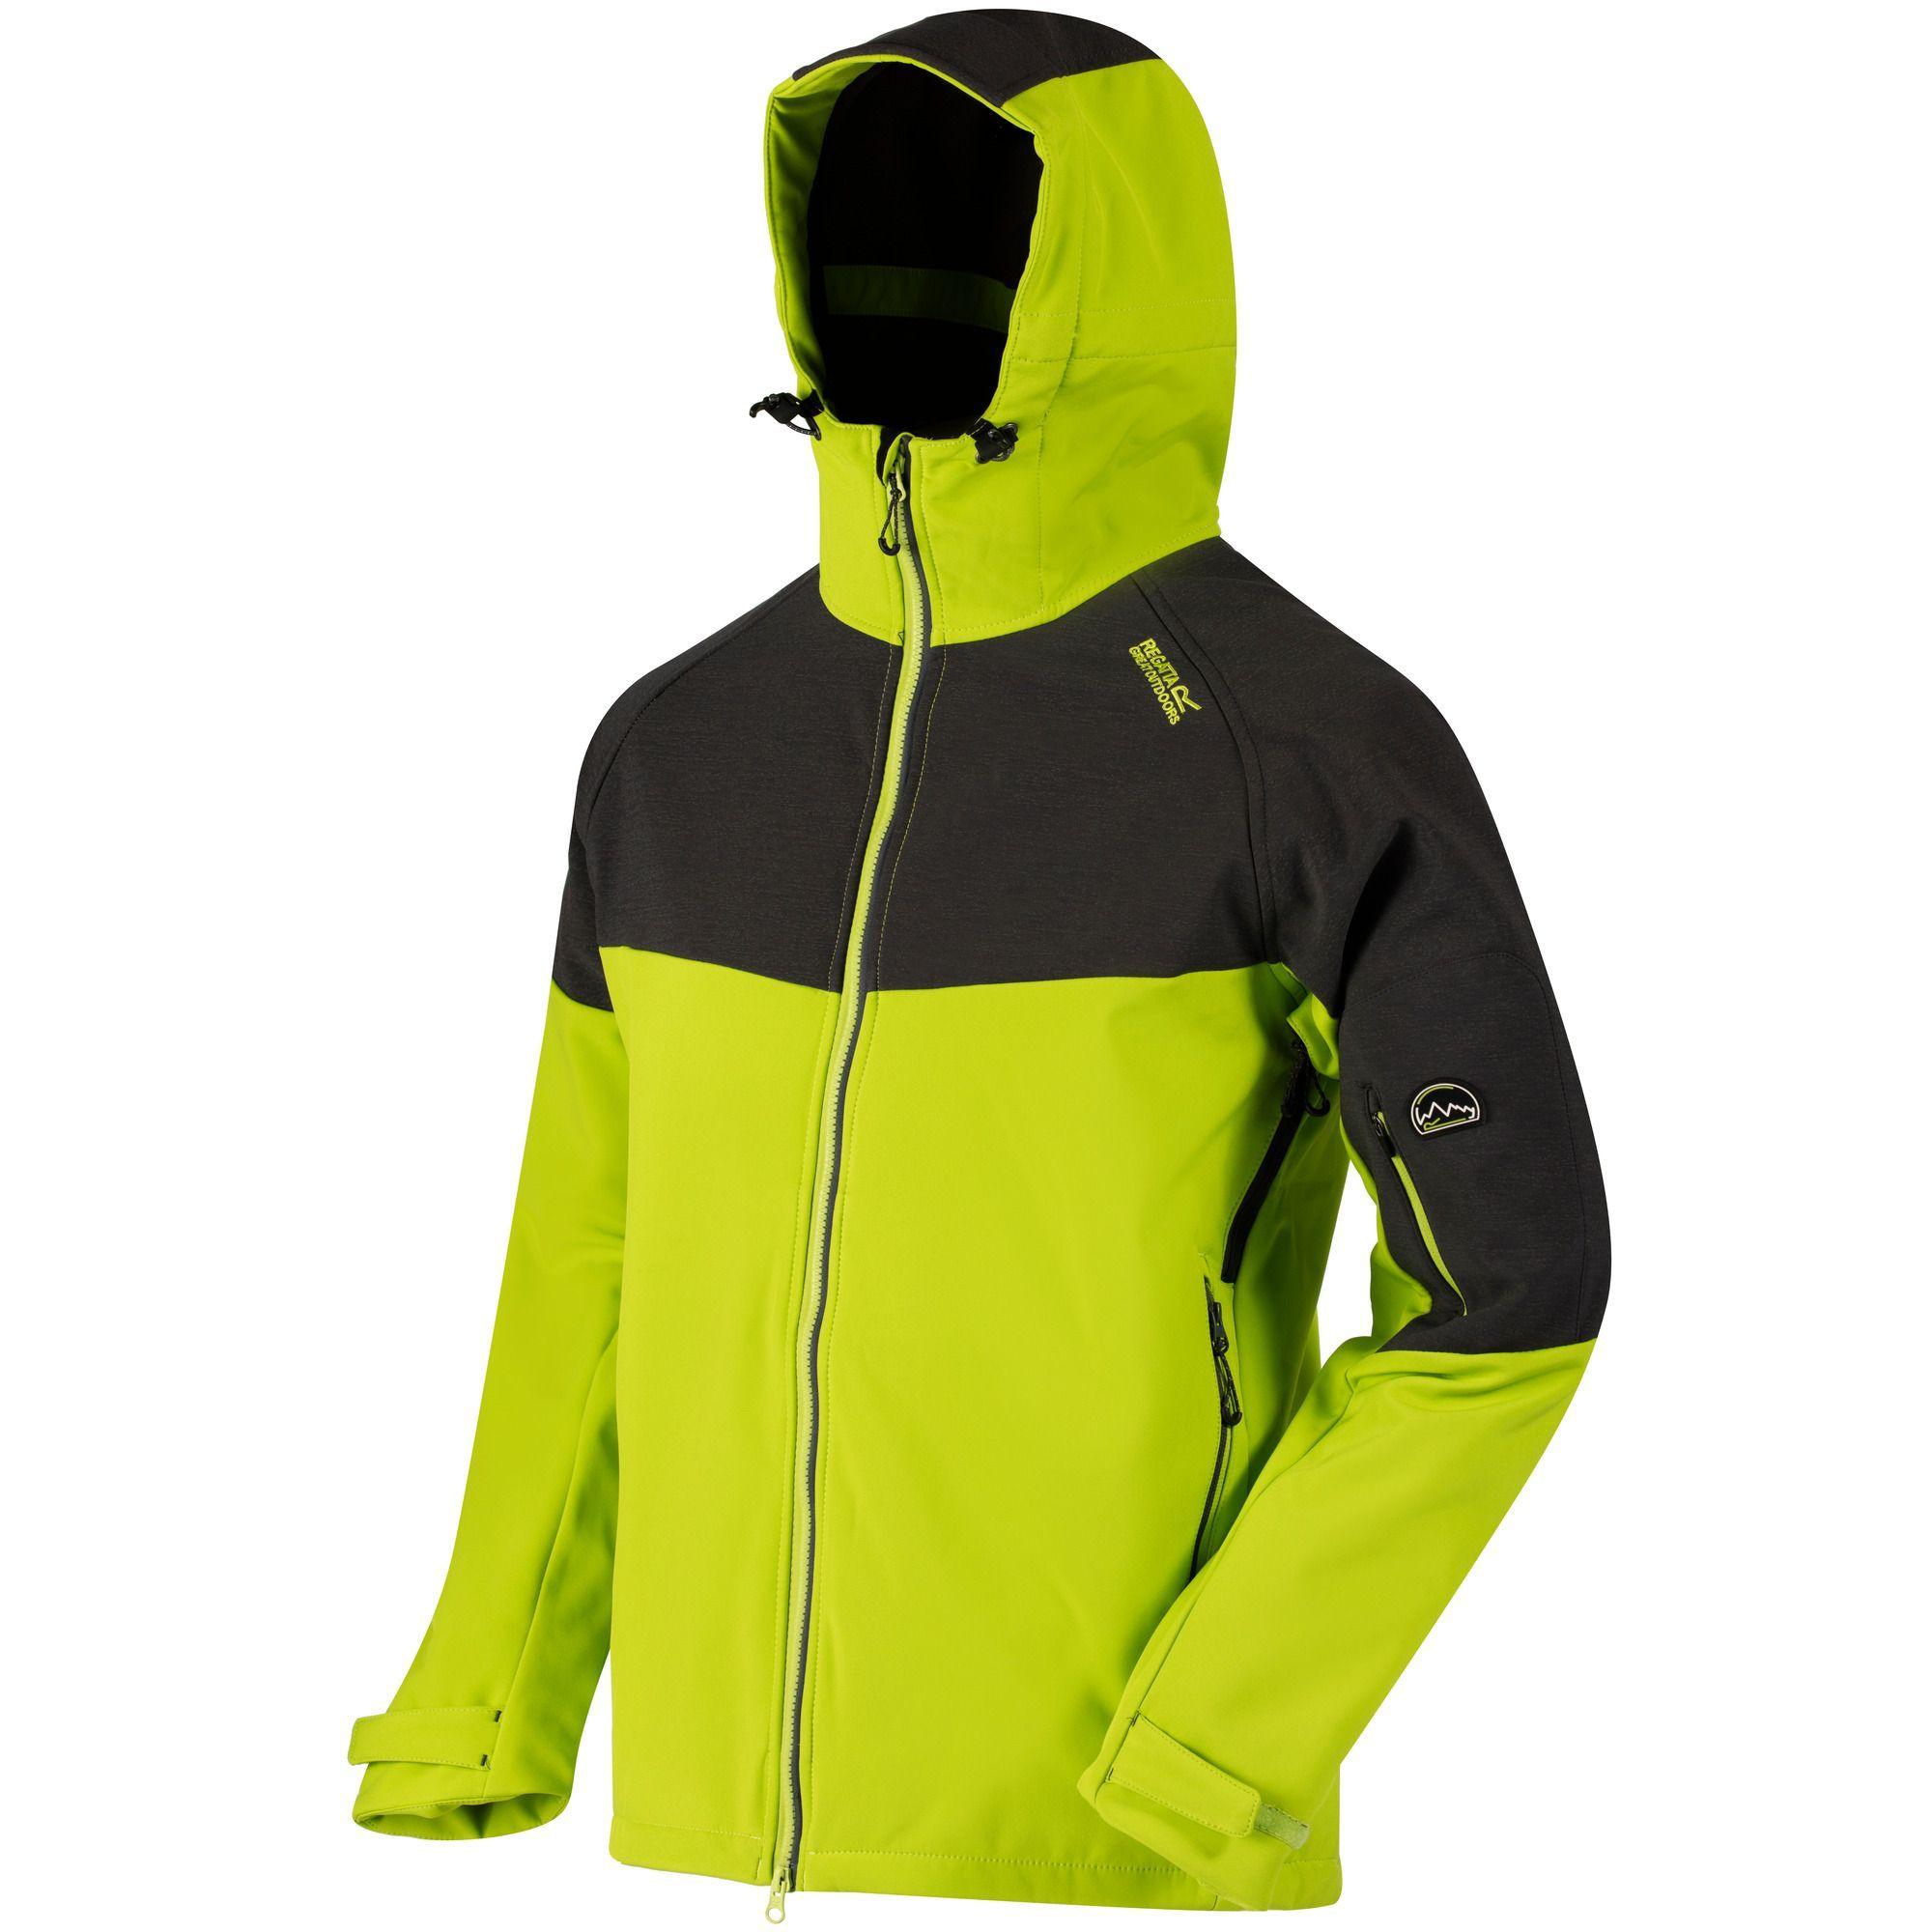 Regatta Great Outdoors Mens Hewitts III Wind Resist Softshell Hooded Reflective Jacket